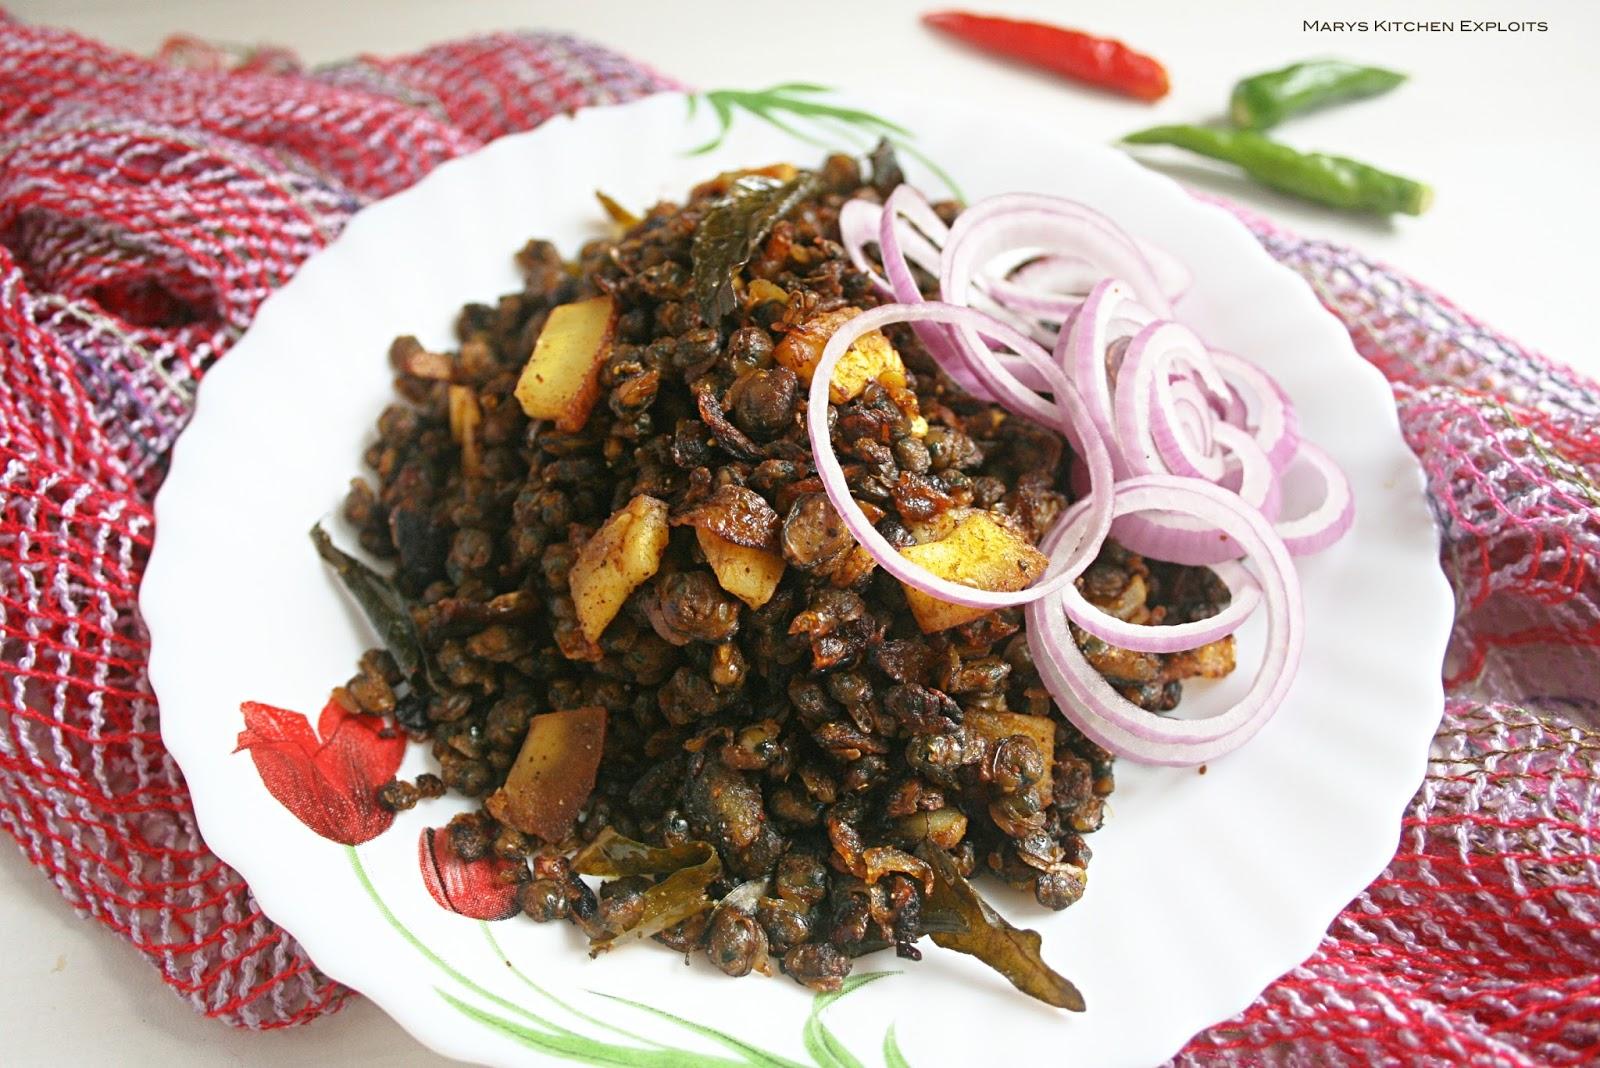 Clam roast kakka eracht roast recipe kerala style flavoured clam roast kakka eracht roast recipe kerala style forumfinder Images